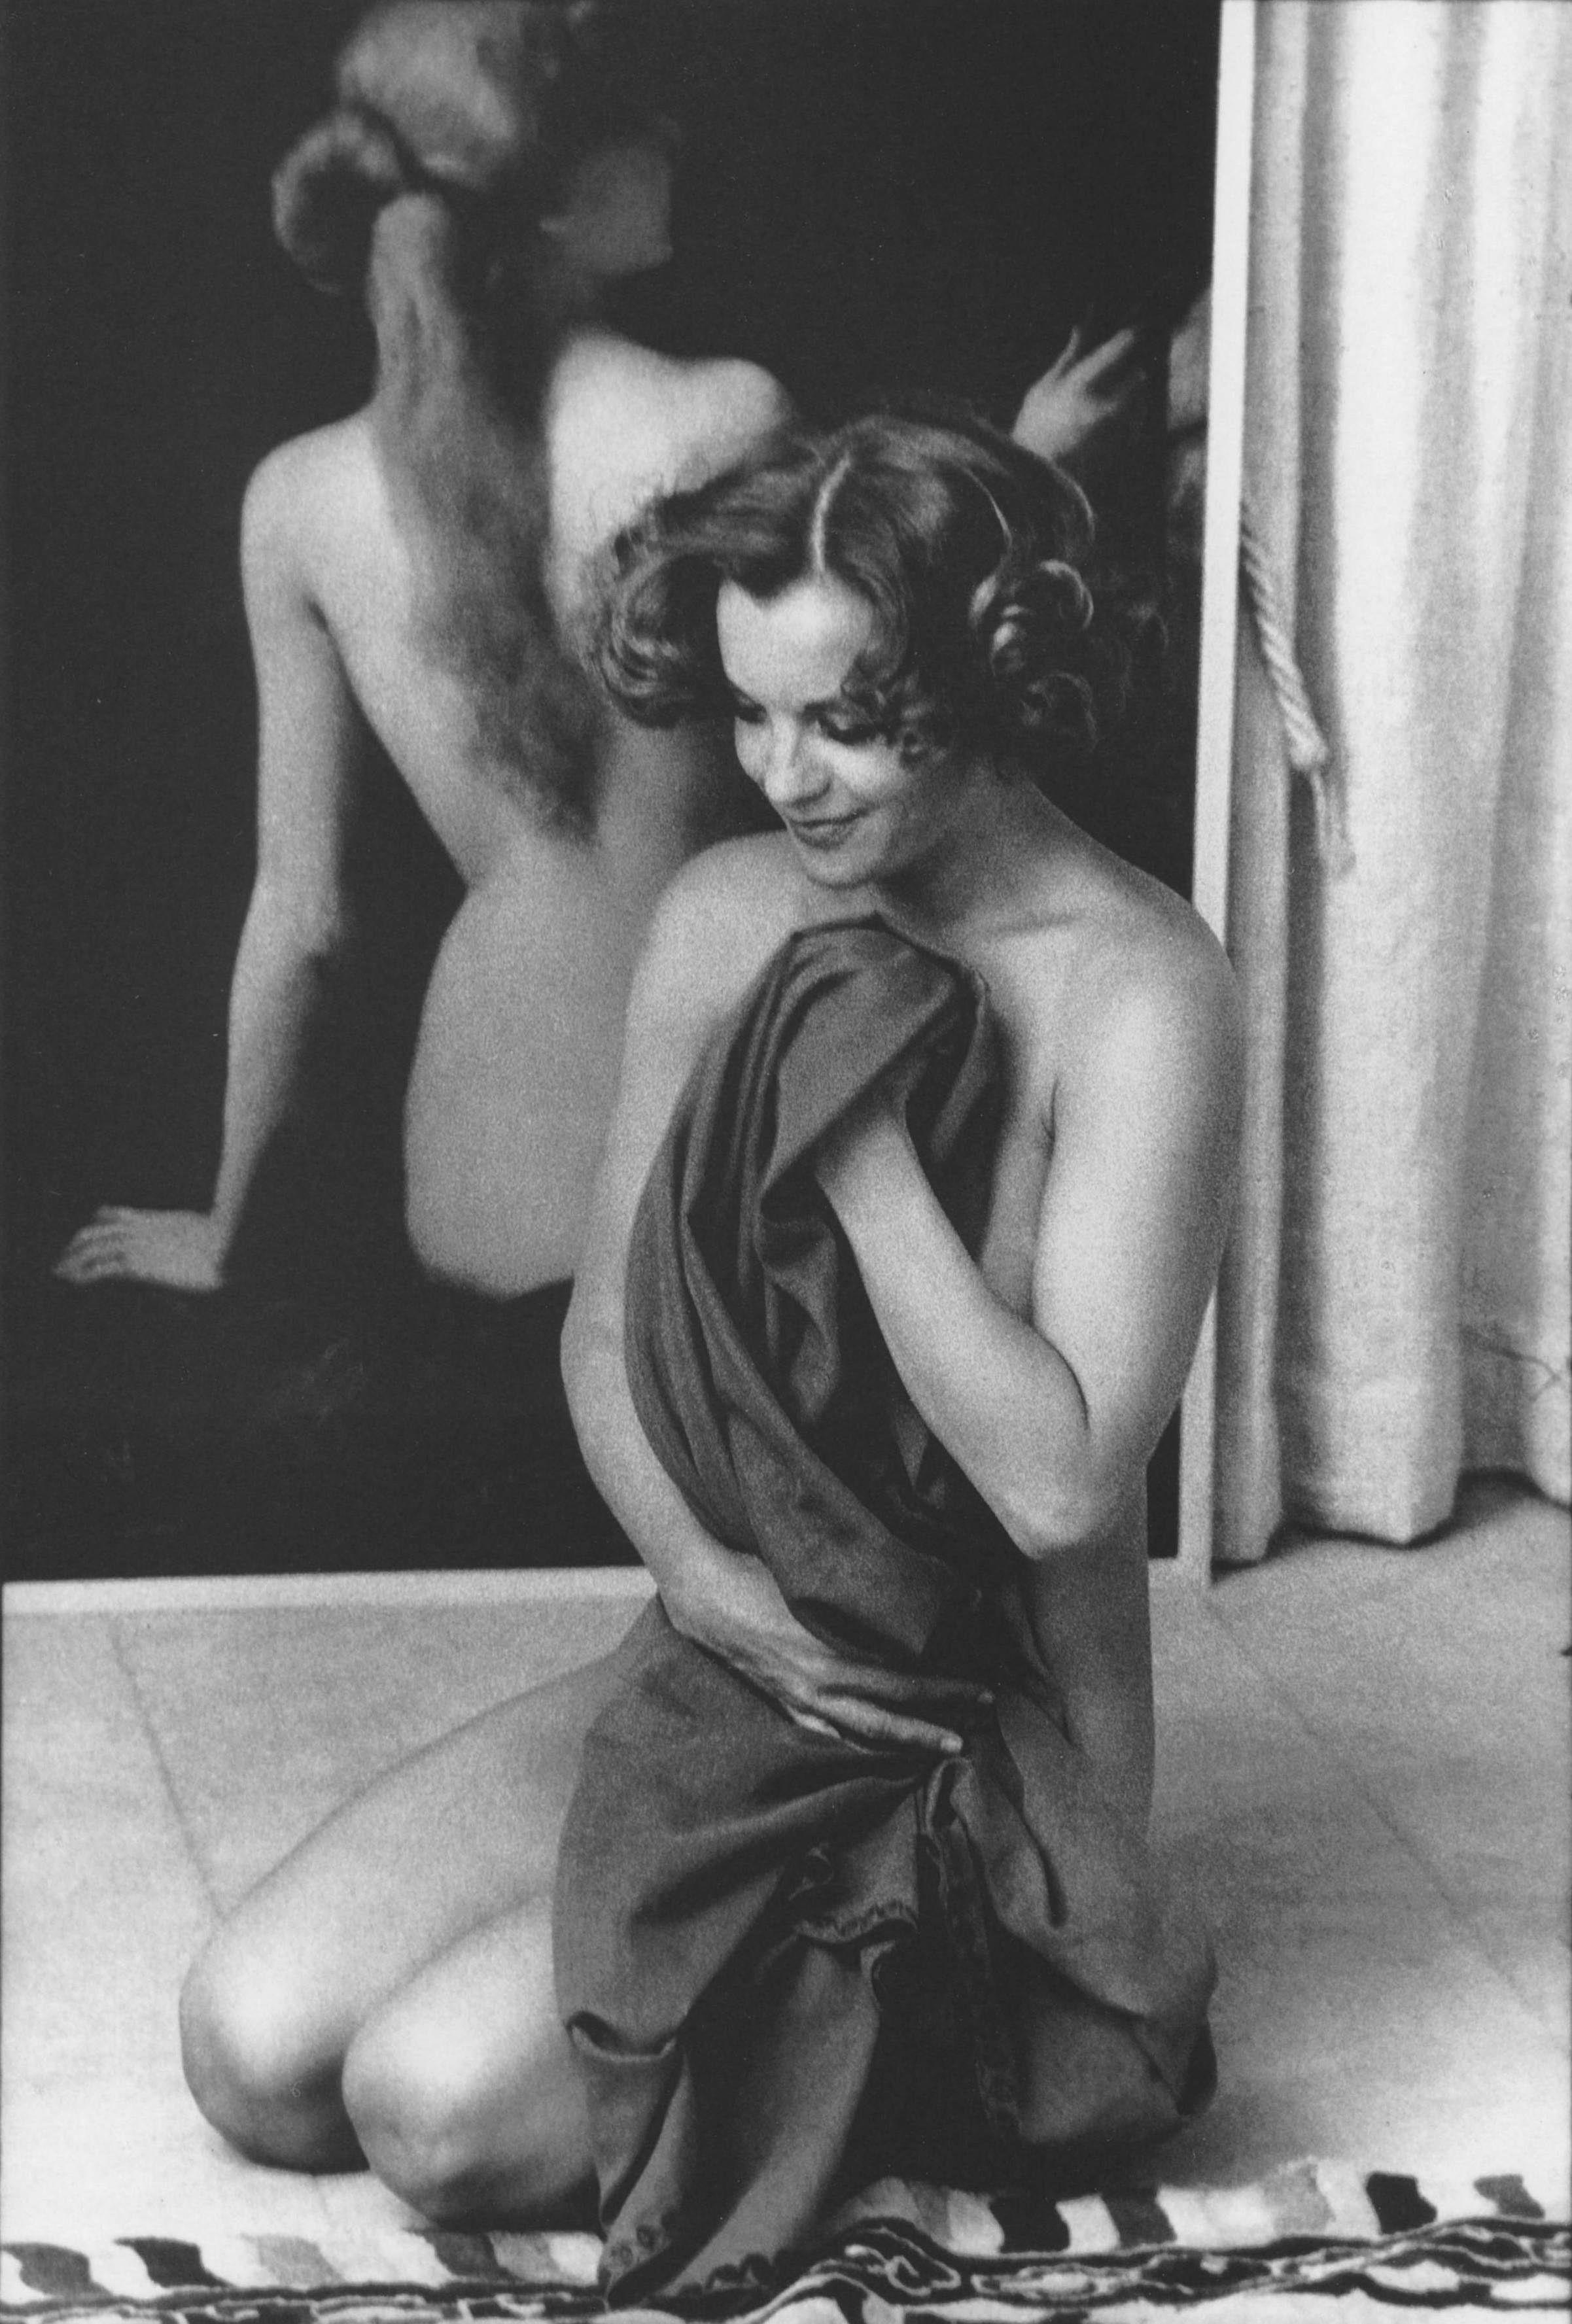 Romy Schneider, Paris, 1974, by Giancarlo Botti